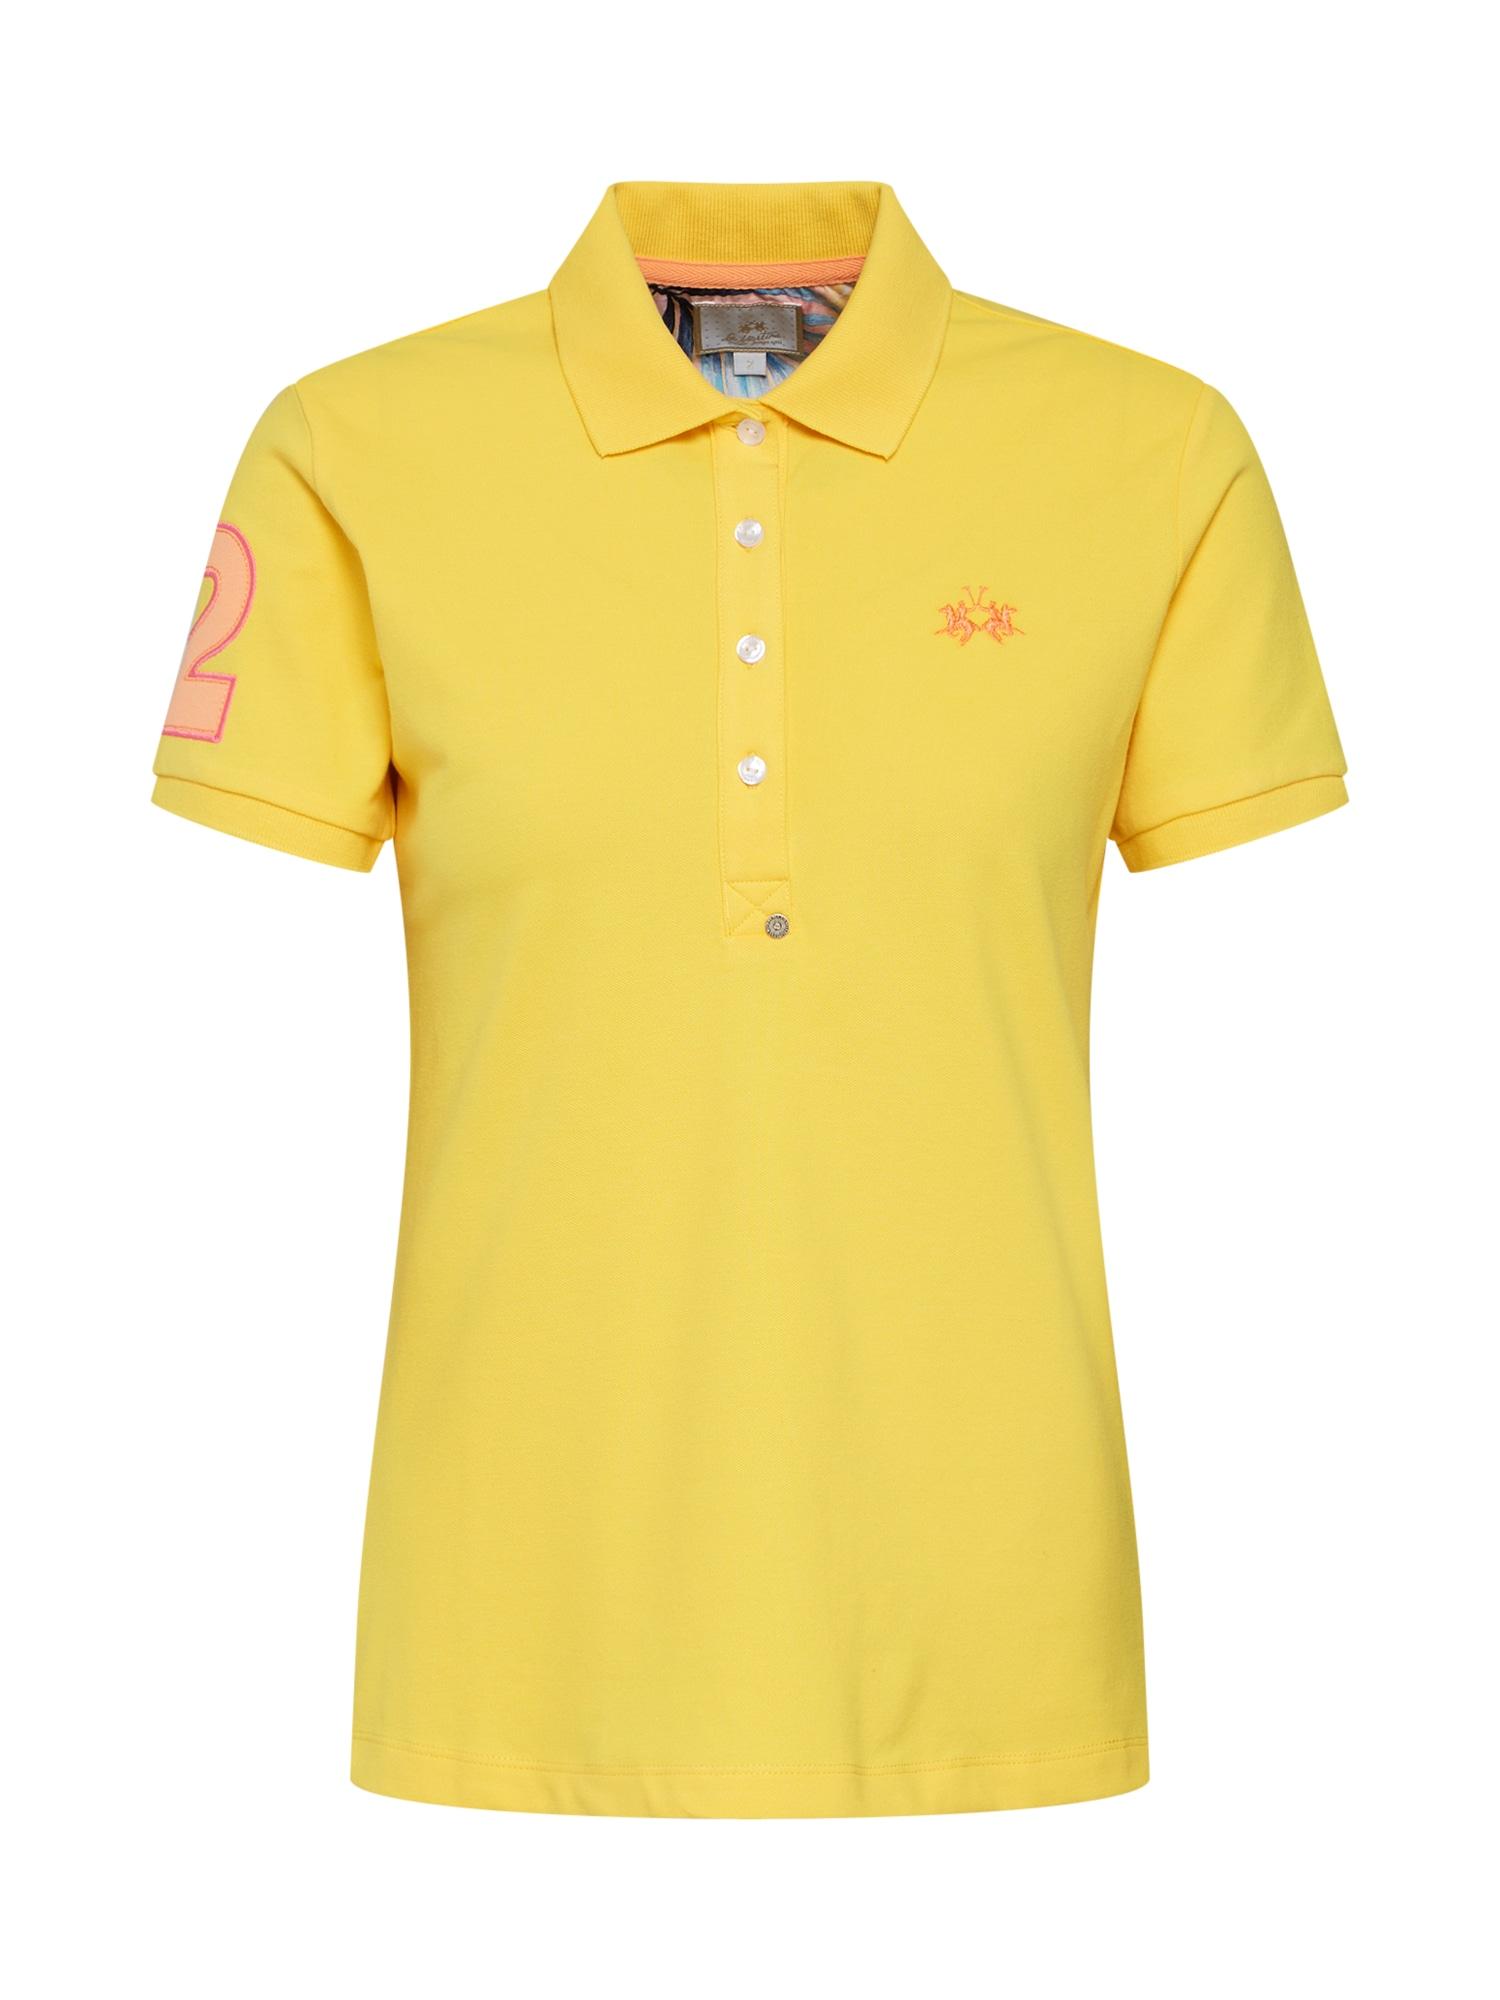 Tričko WOMAN POLO PIQUET STRETCH žlutá La Martina